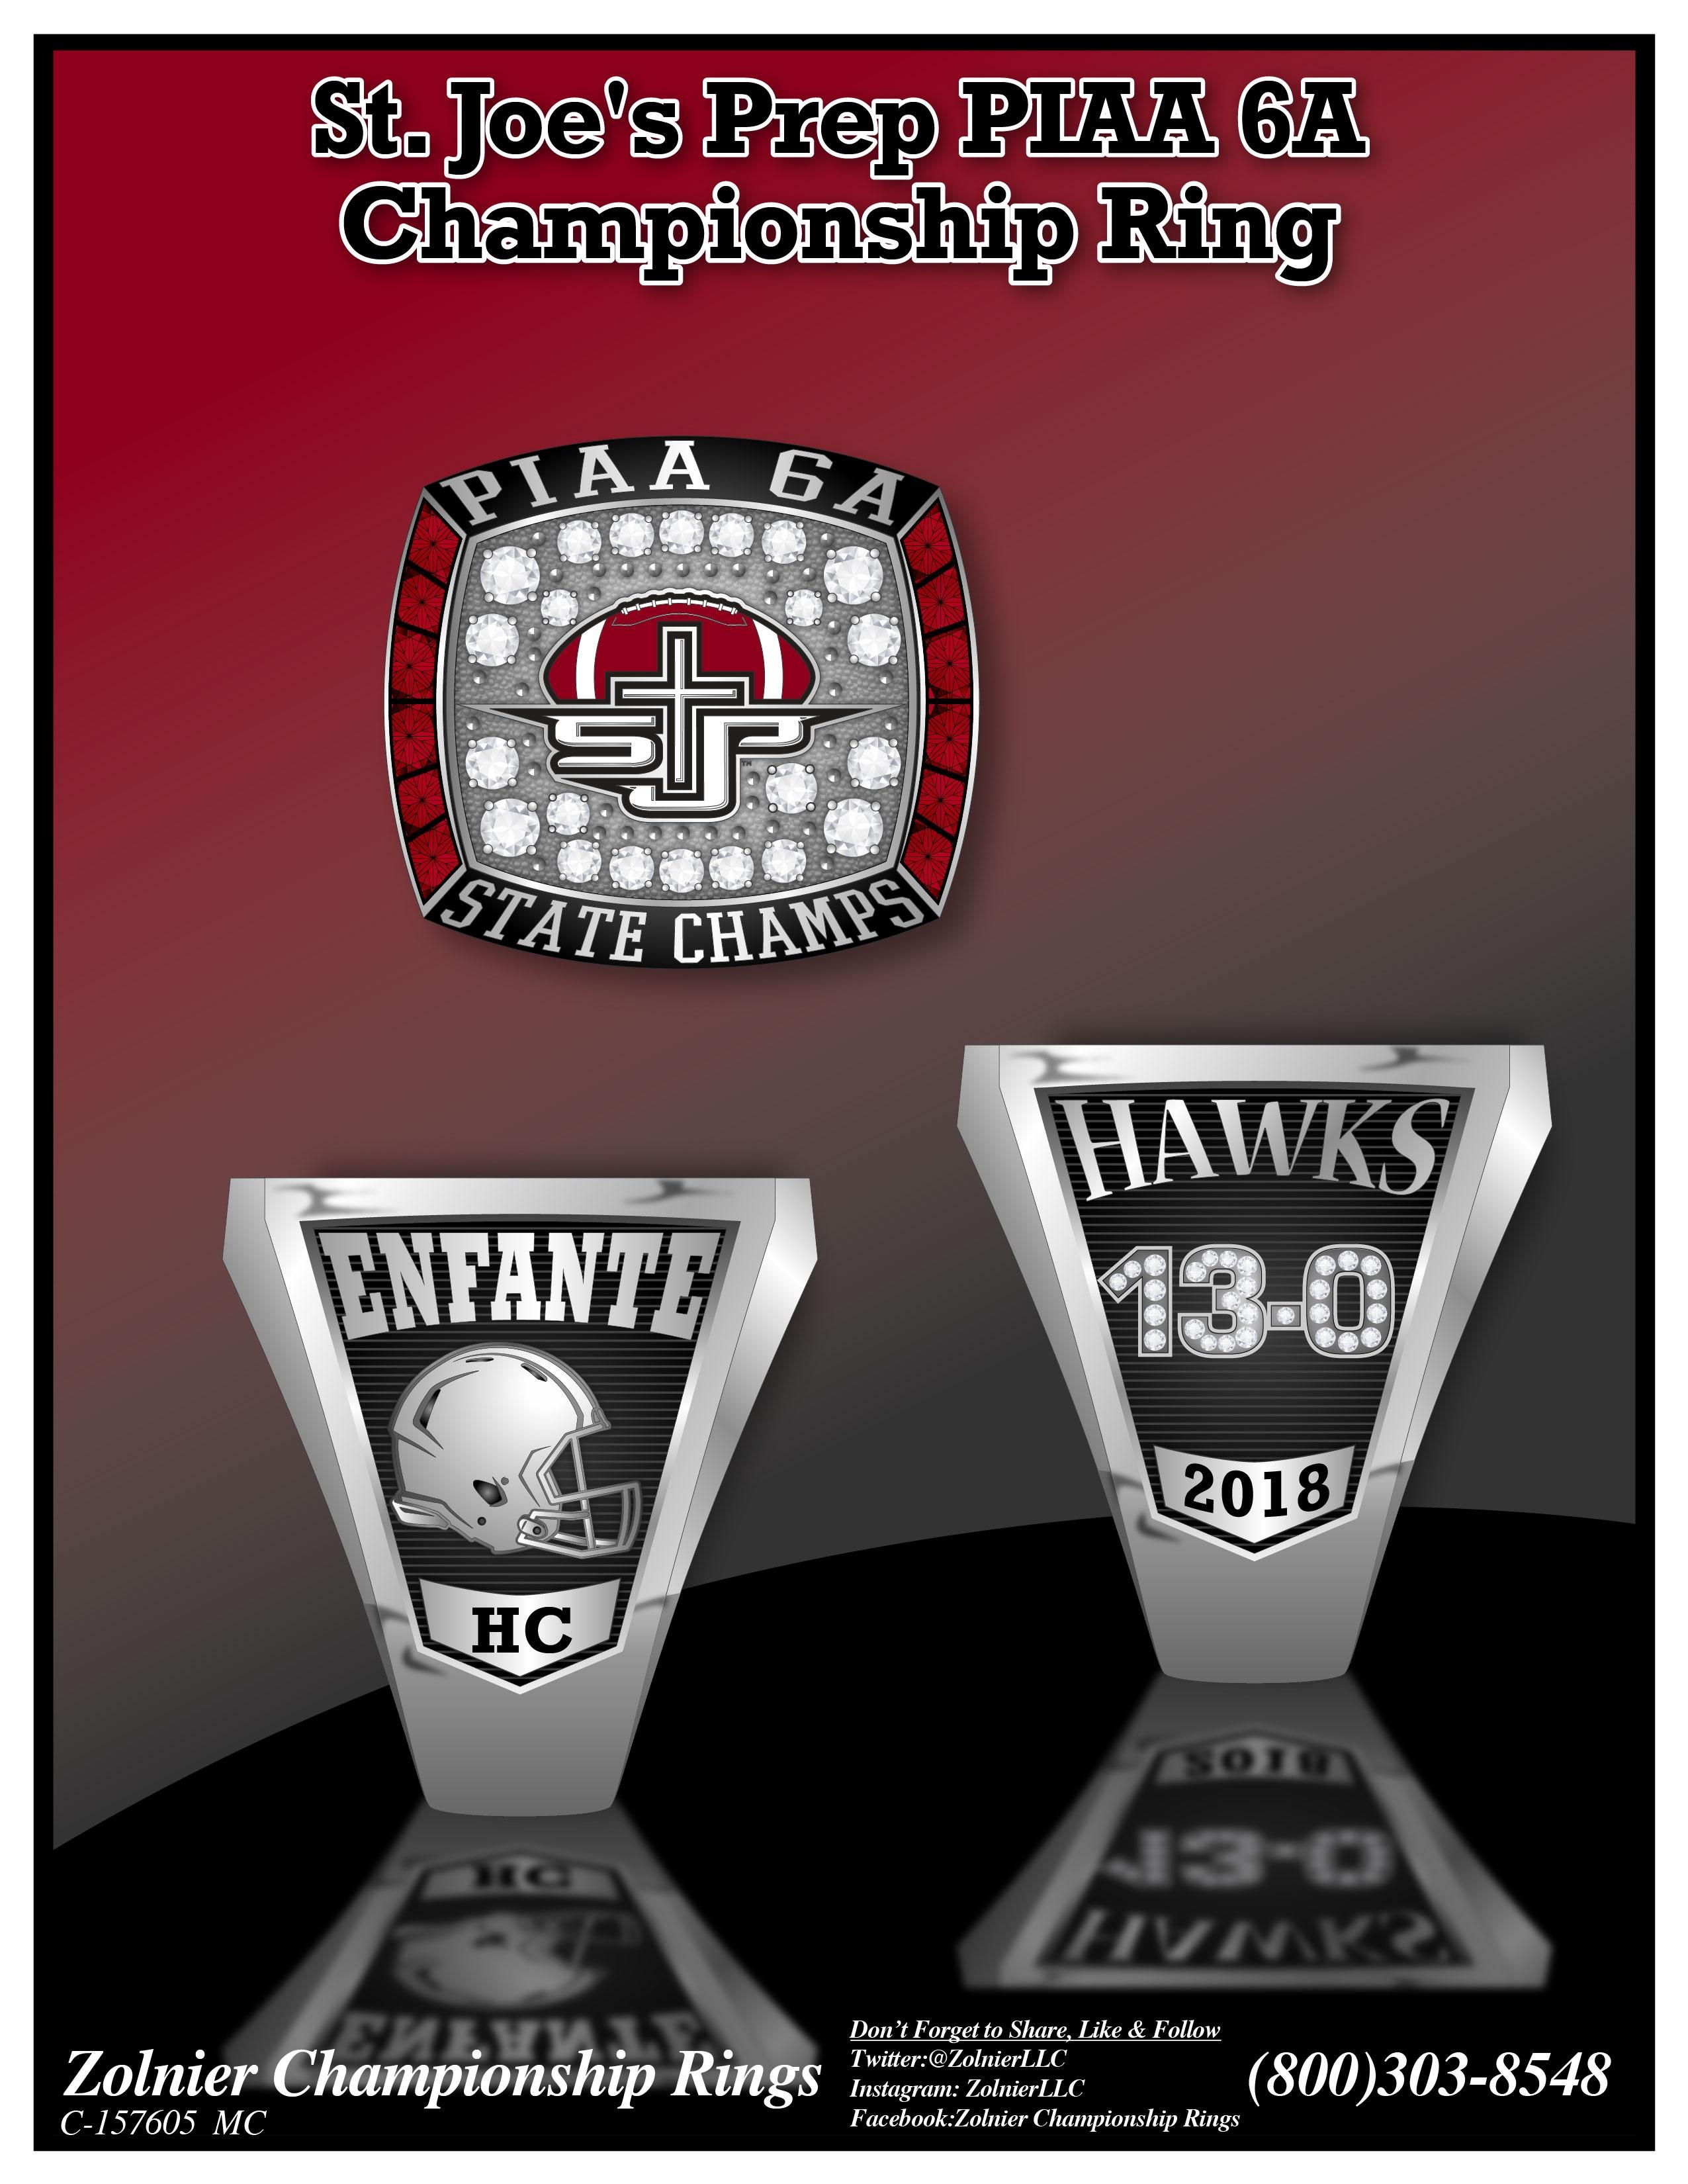 C-157605 Saint Joe's Prep Football Champ Ring